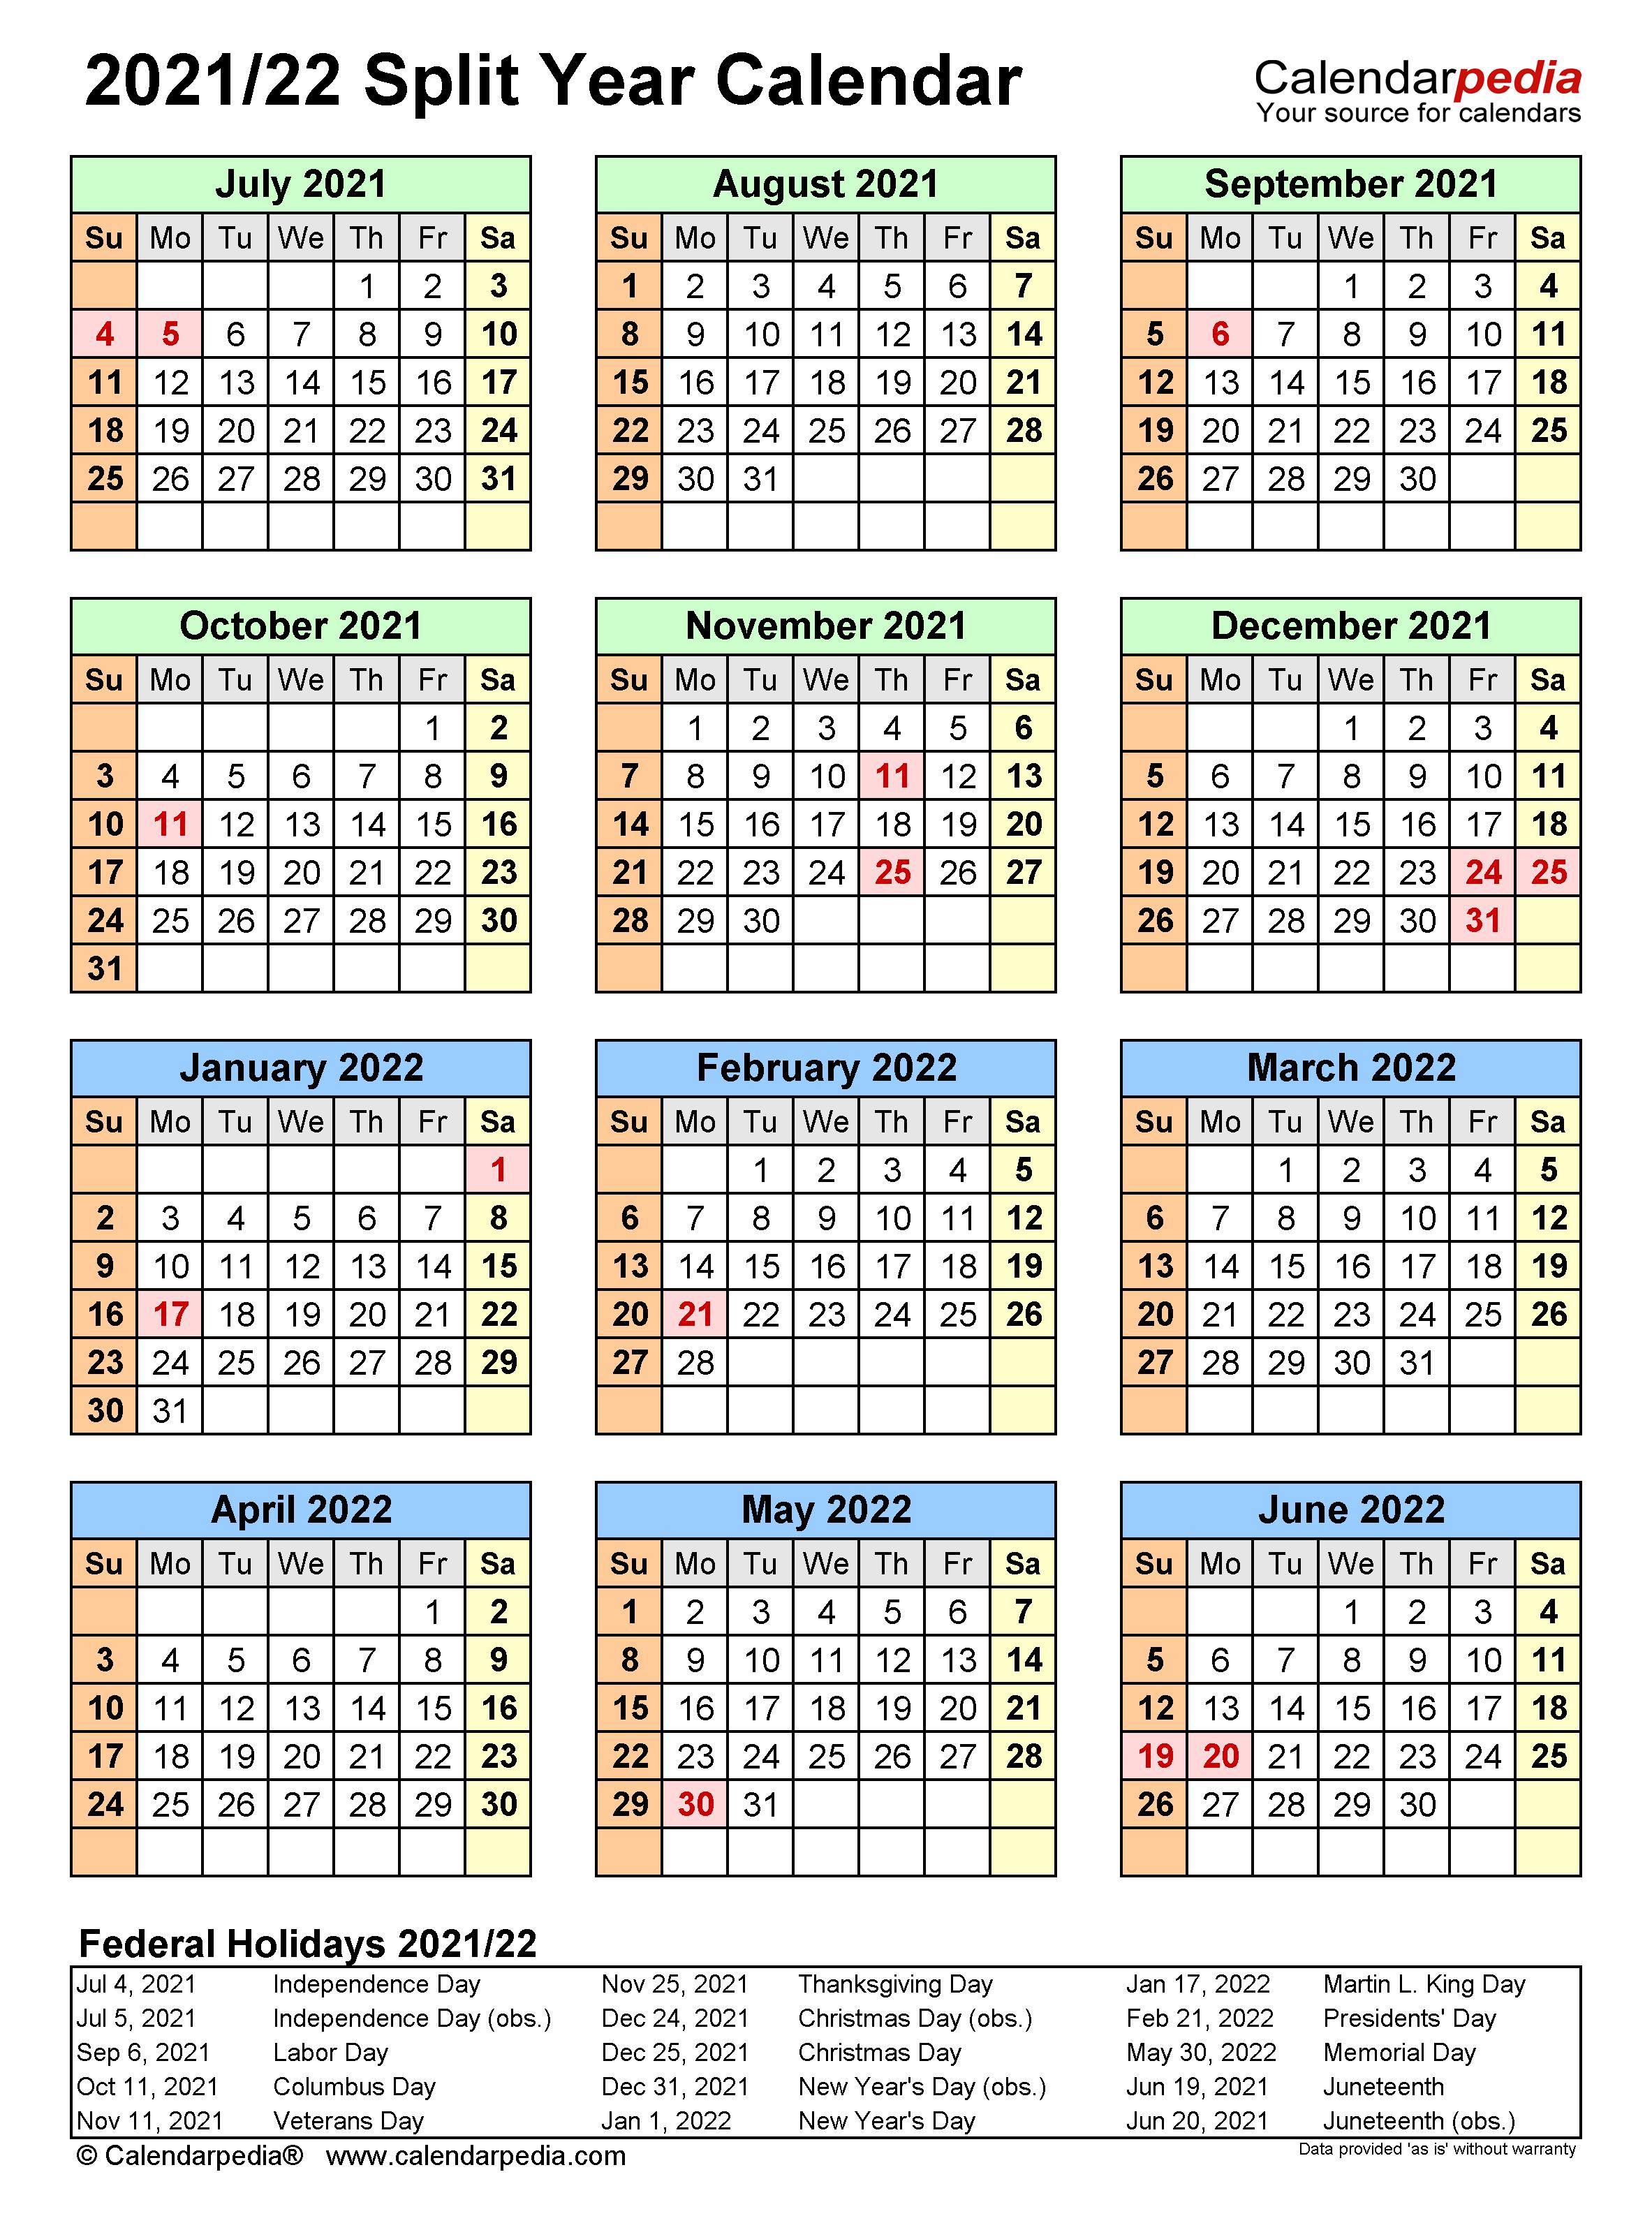 Calendar July 2021 To June 2022